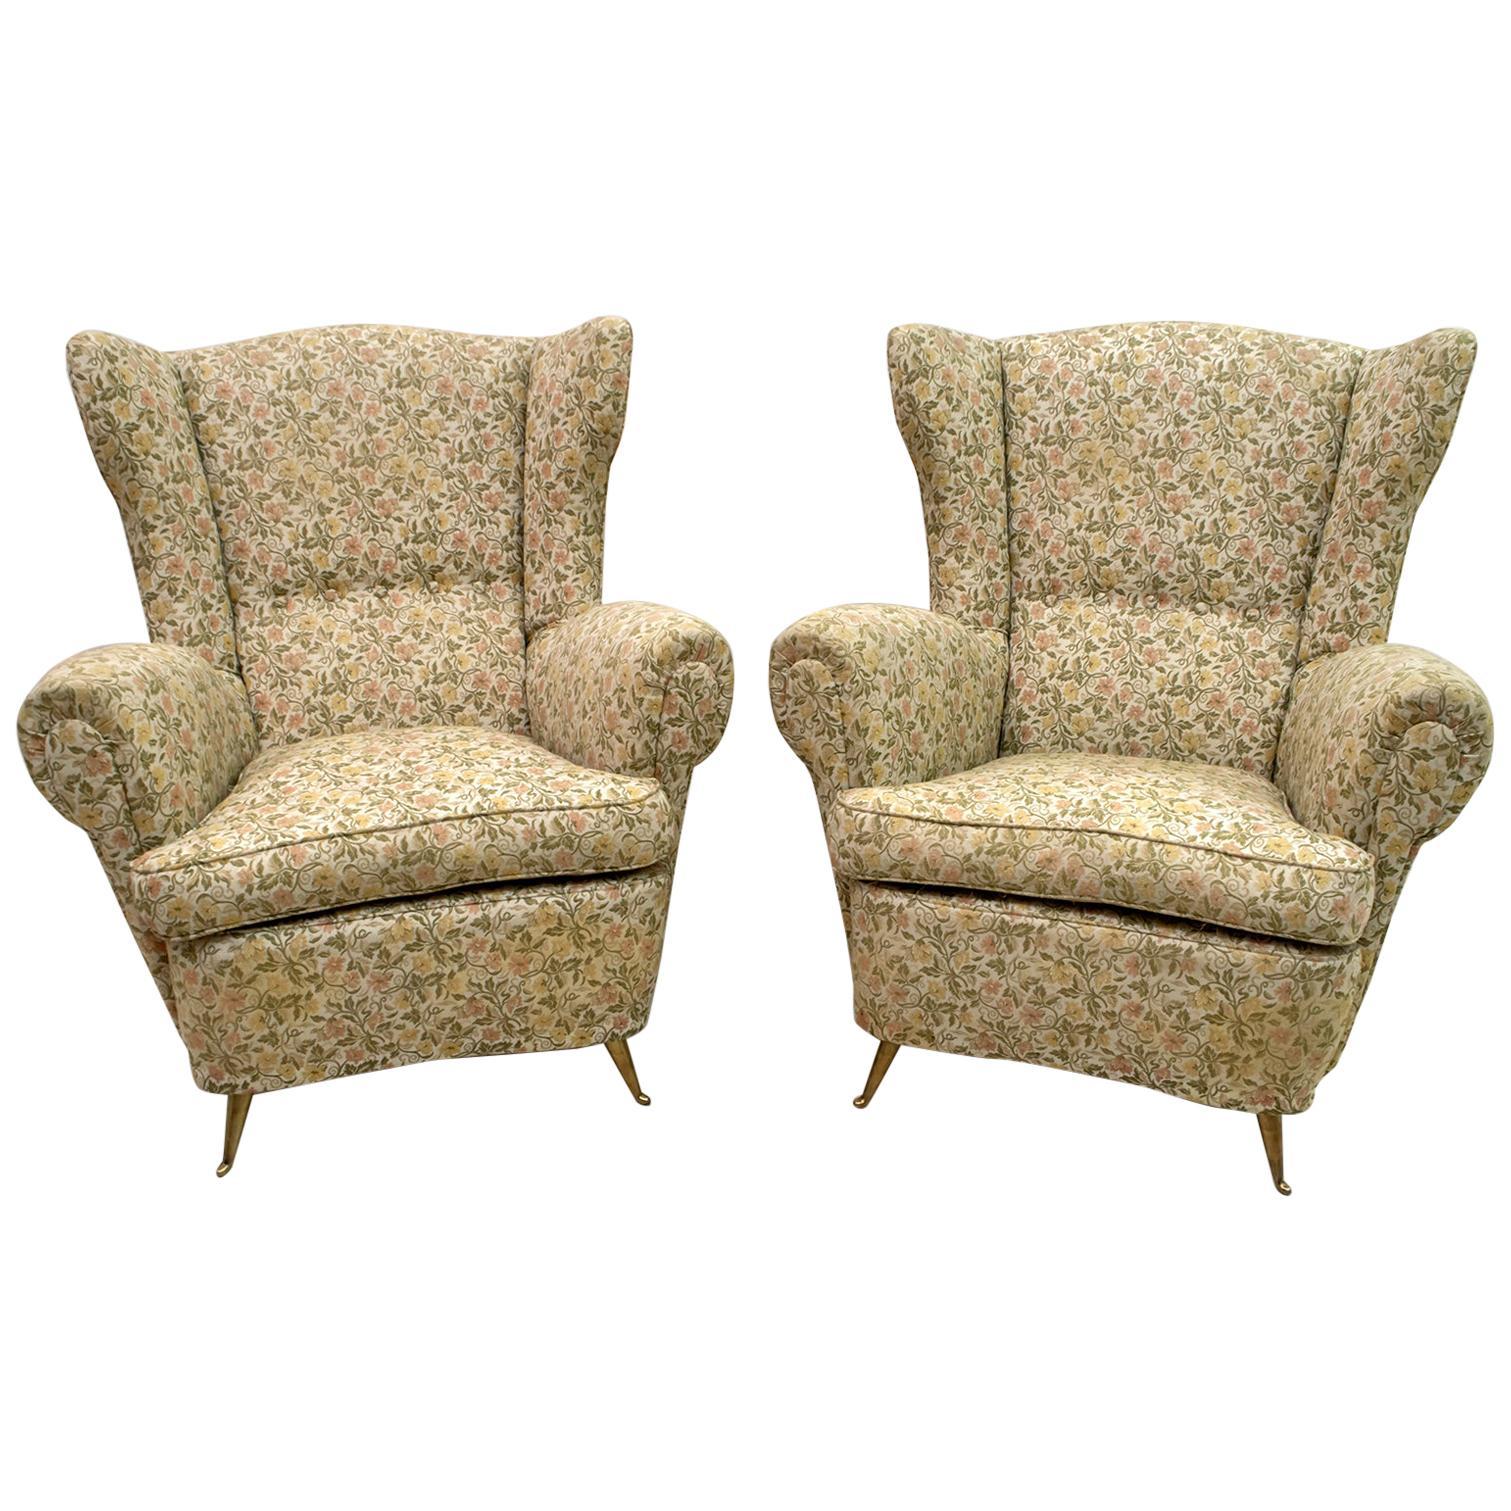 Pair of Gio Ponti Mid-Century Modern Italian High Back Armchairs for ISA, 1950s